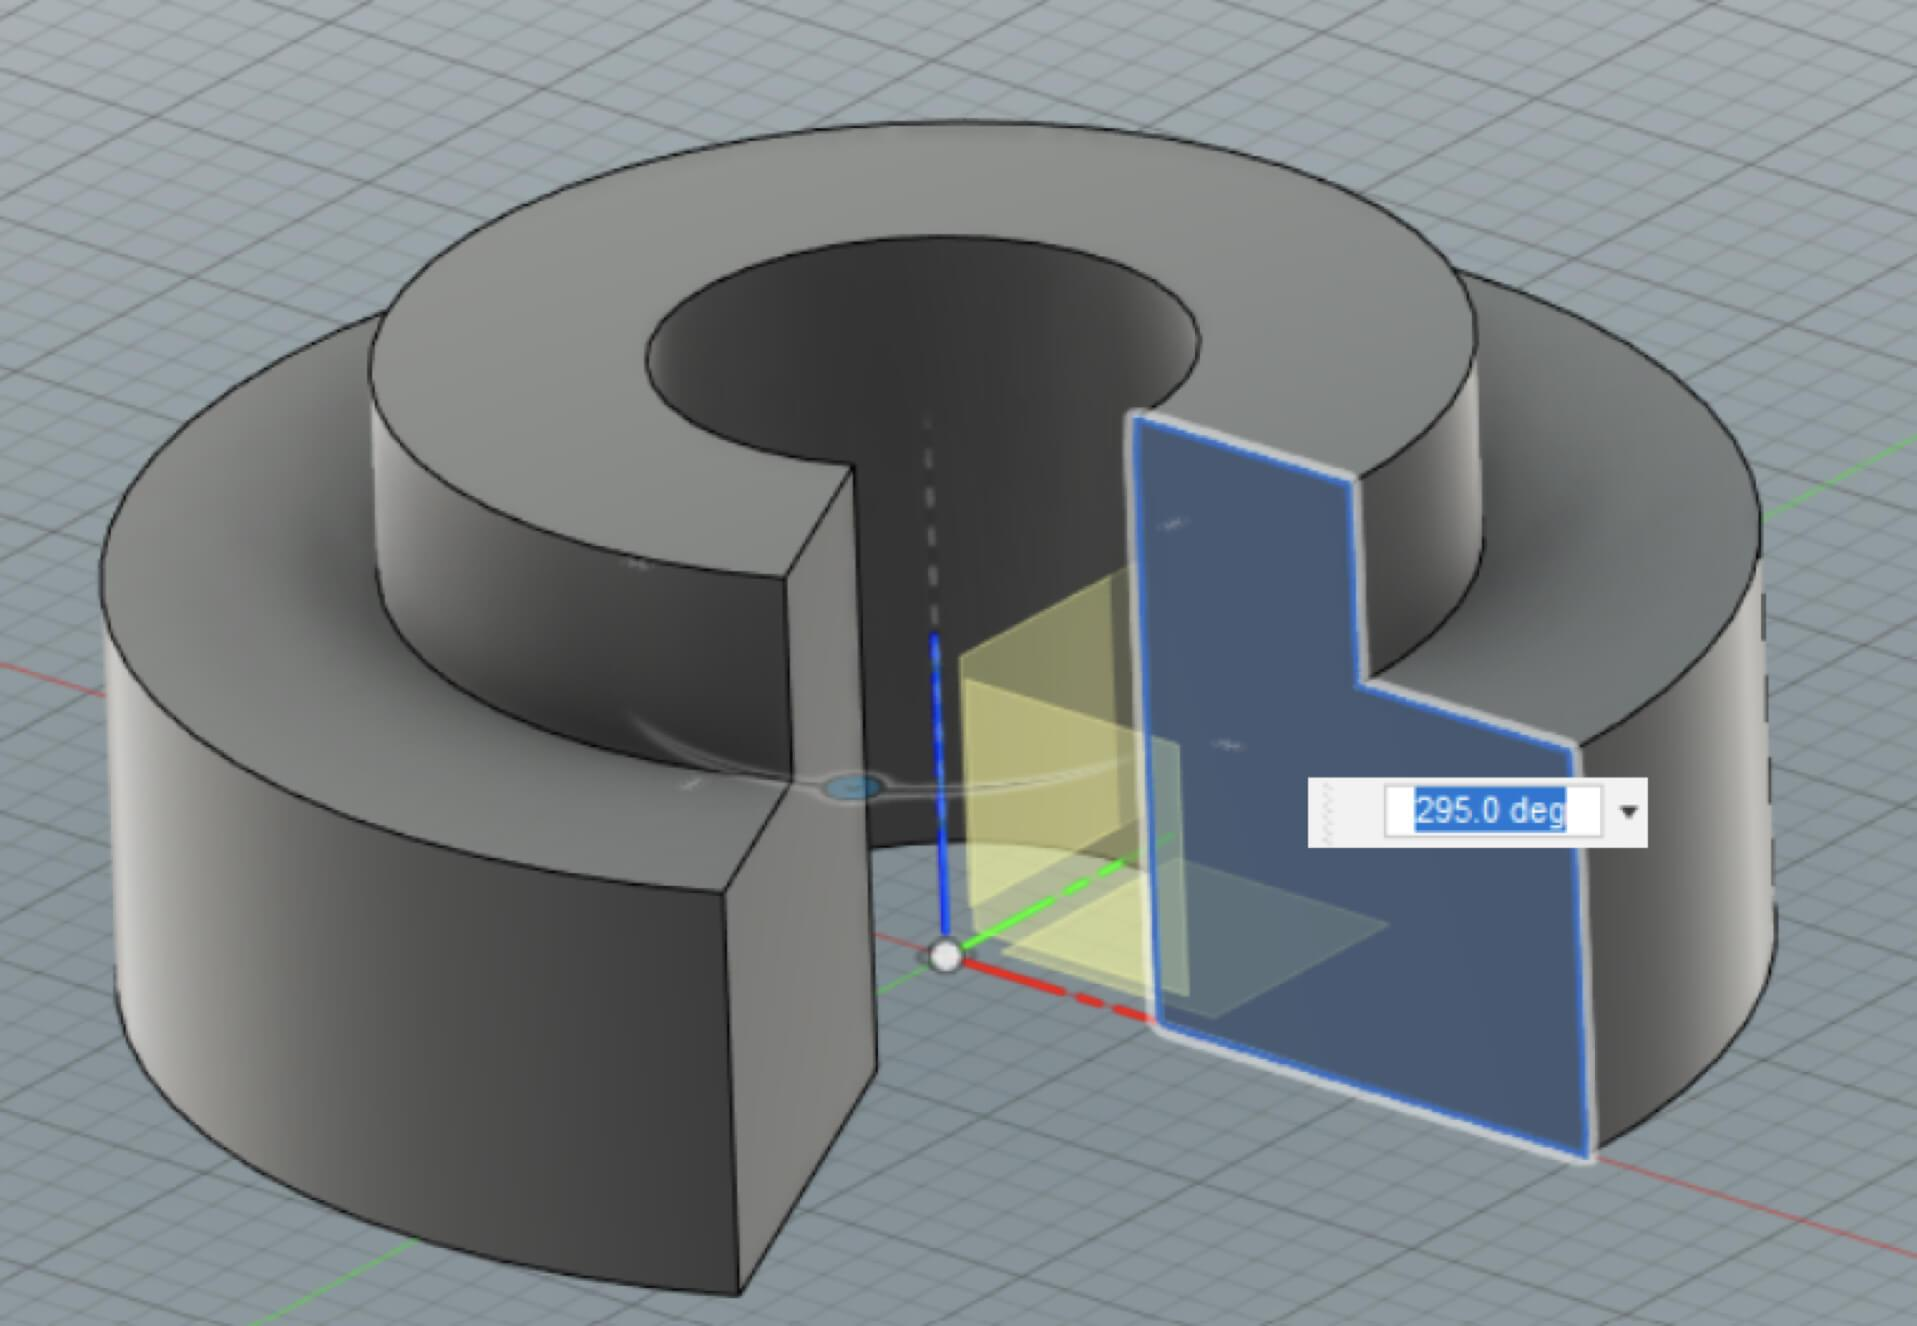 column-20200901-02-ph10.jpg